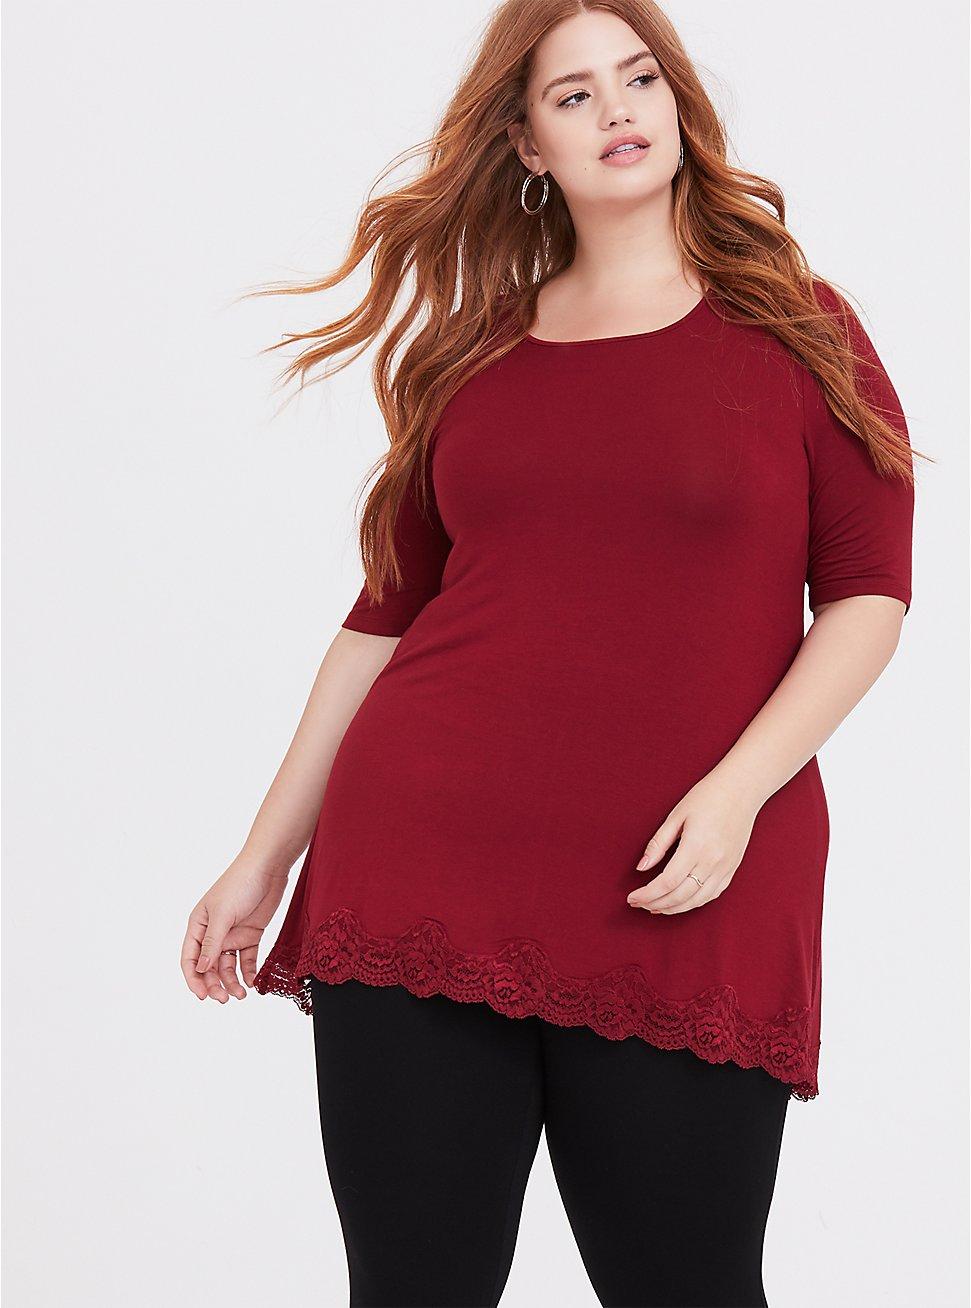 Plus Size Super Soft Dark Red Lace Trim Tunic Tee, BIKING RED, hi-res